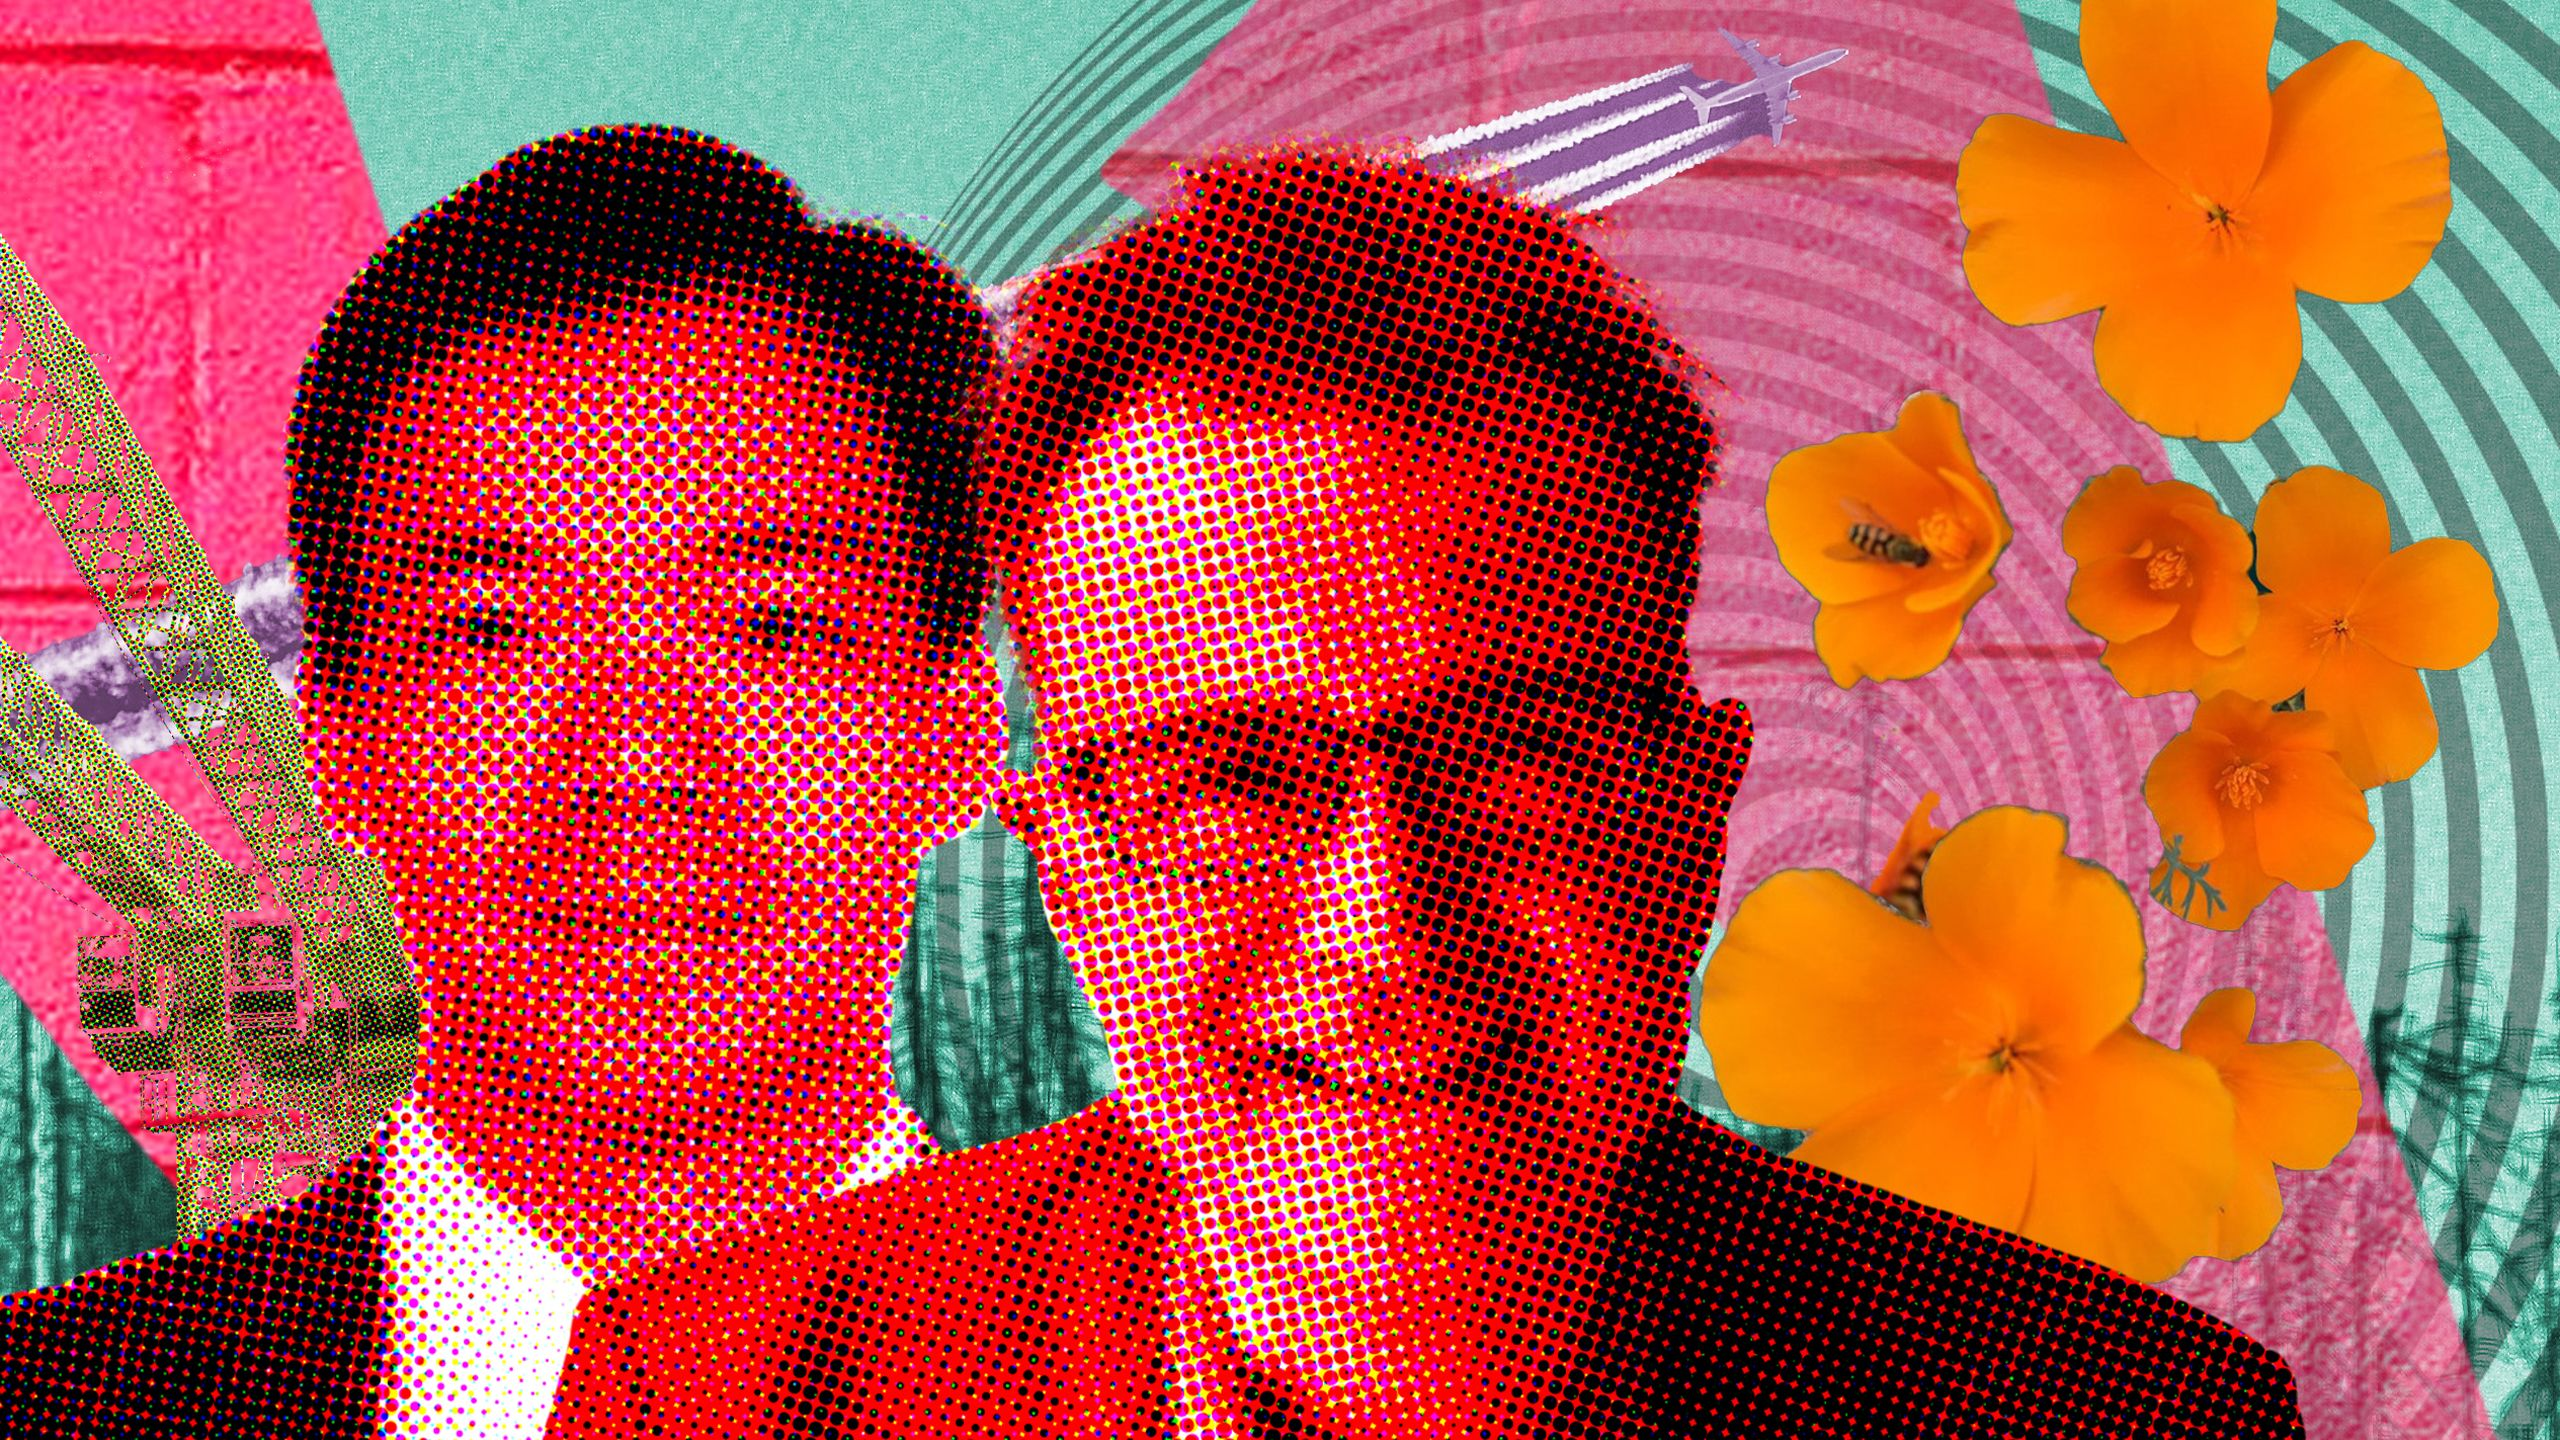 Simon Deakin and Gaofeng Meng